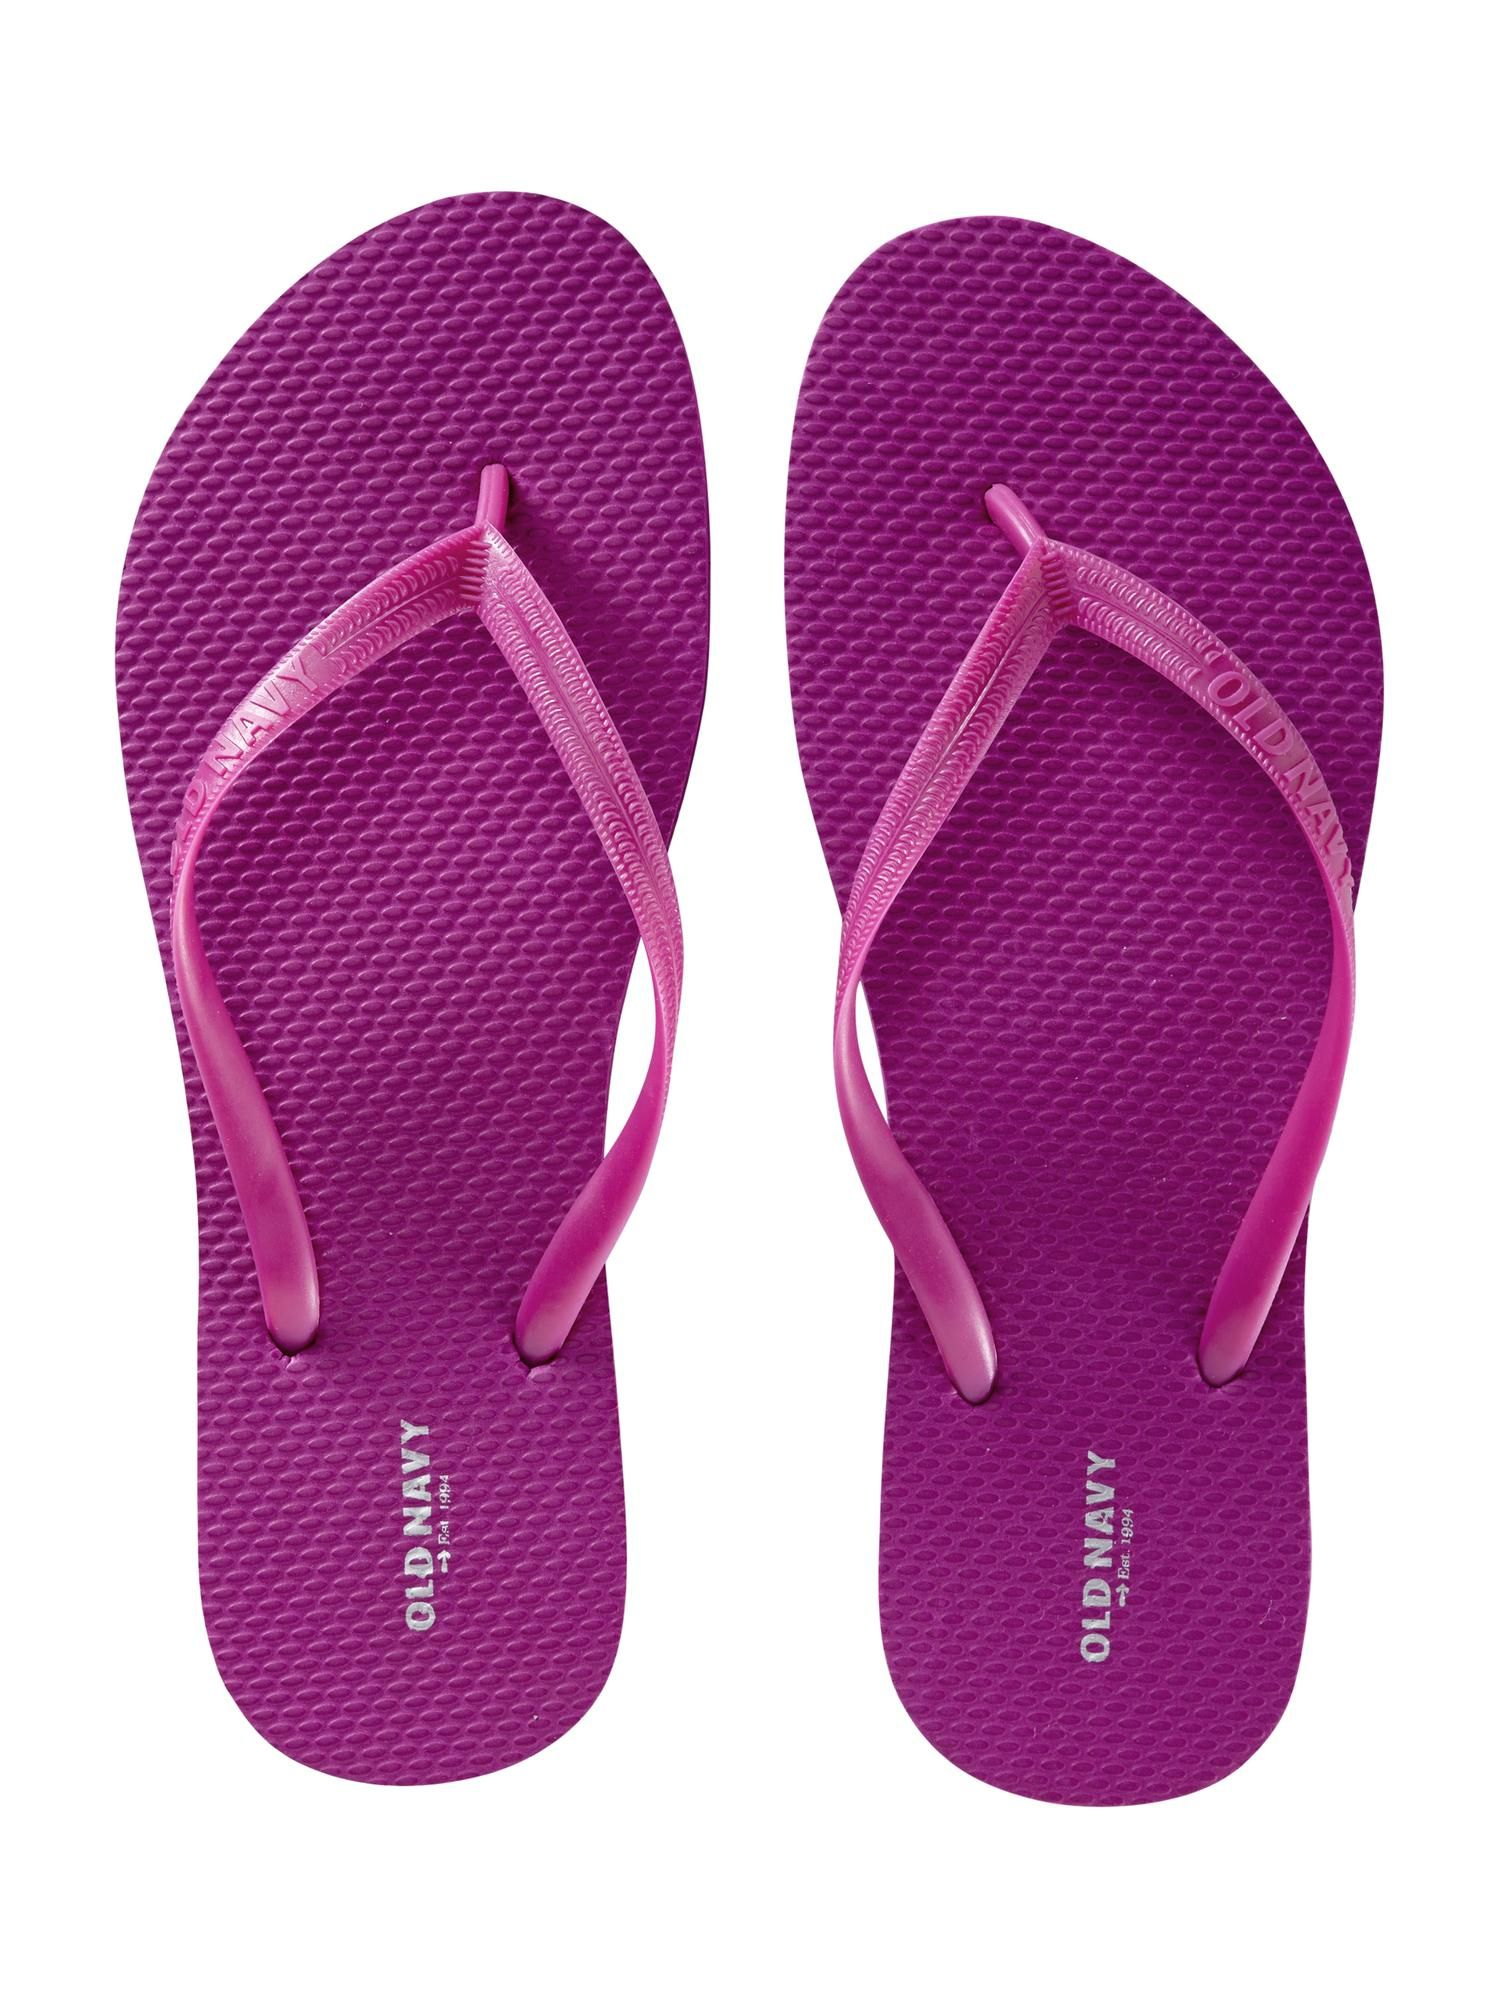 6f6772d67 Classic Flip-Flops for Women in 2019